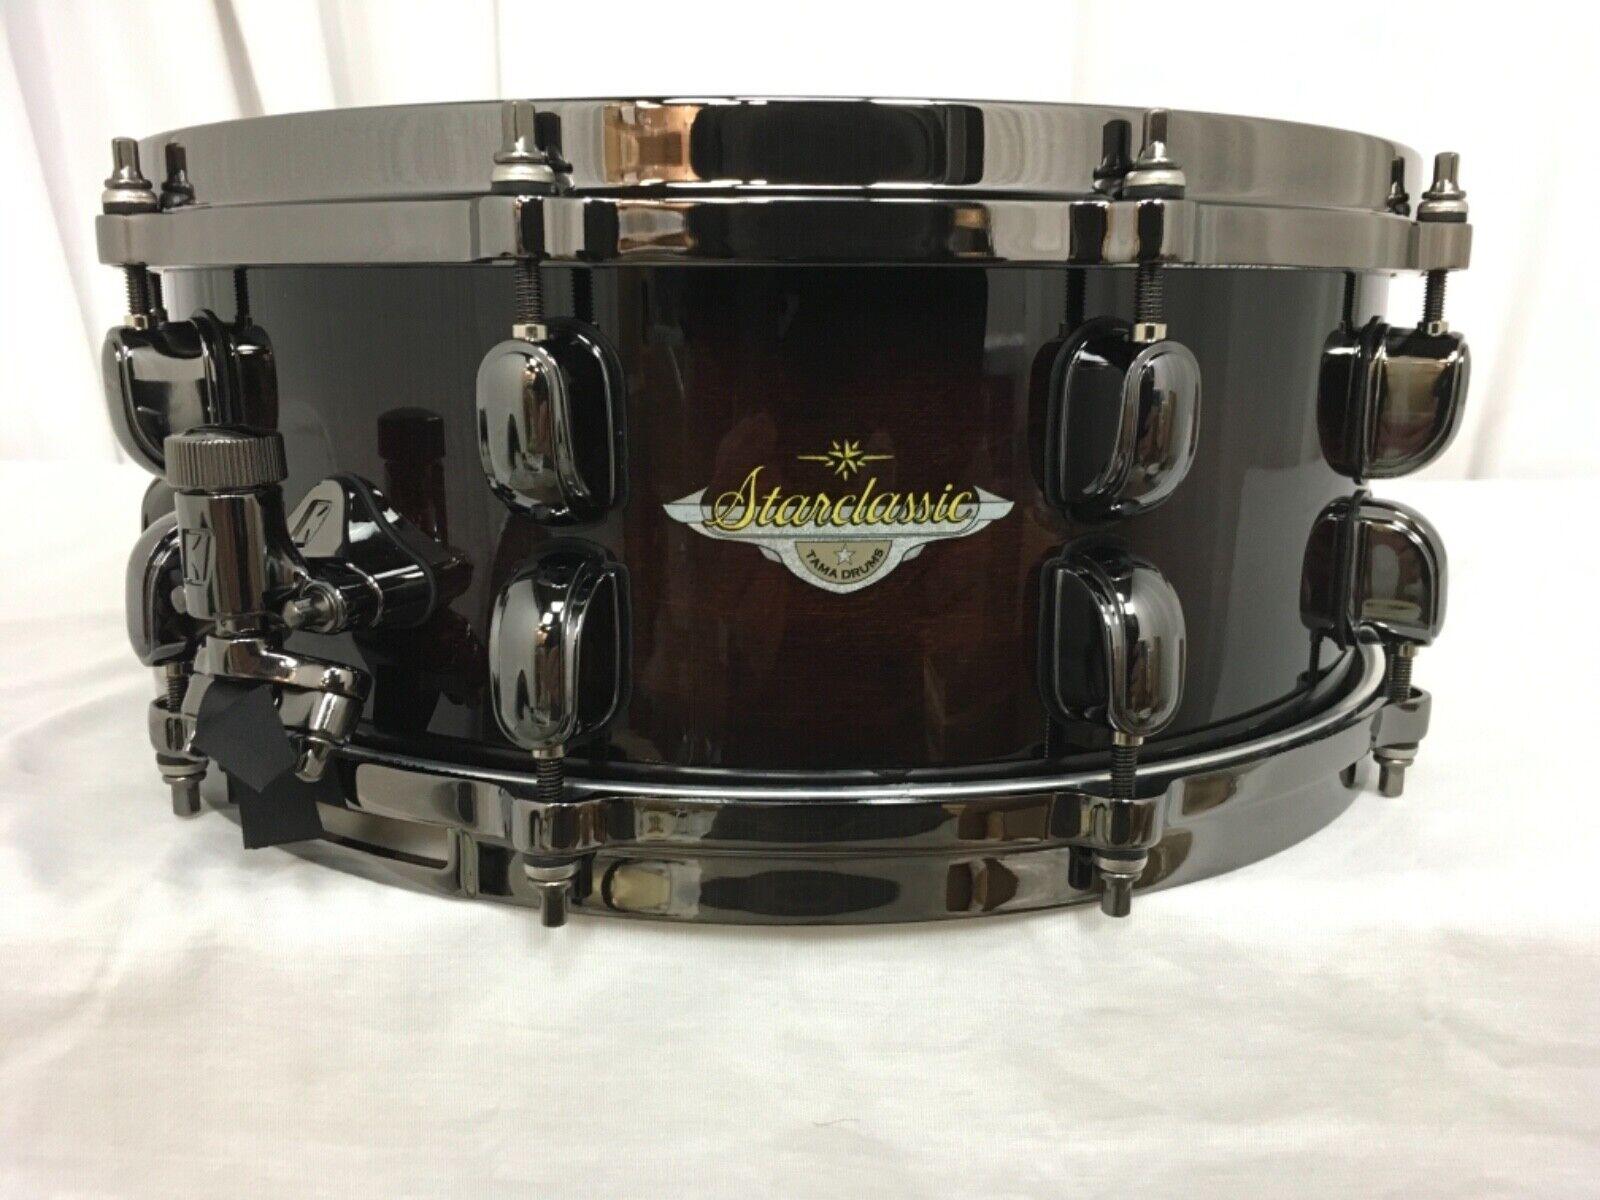 Tama Starclassic Maple 14  X 5.5  Snare Drum Dark Mocha Burst MAS1455BN-DMB NEW